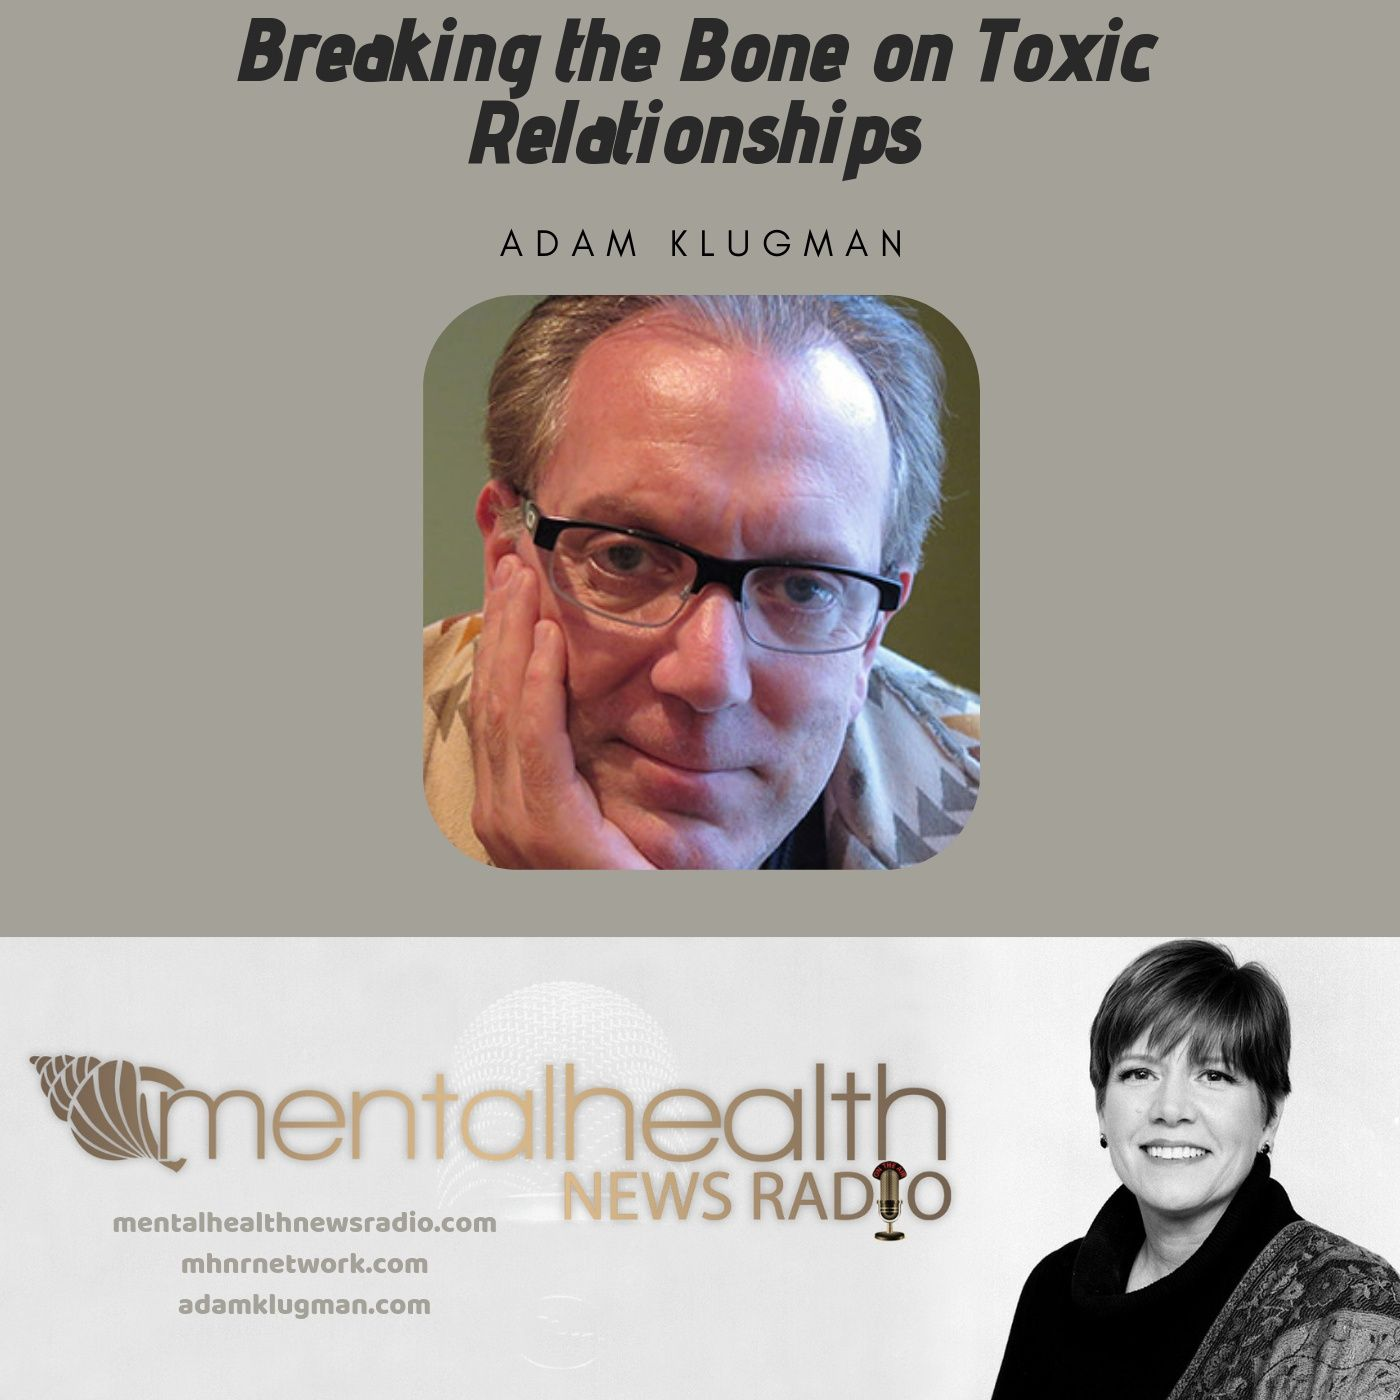 Mental Health News Radio - Breaking the Bone on Toxic Relationships